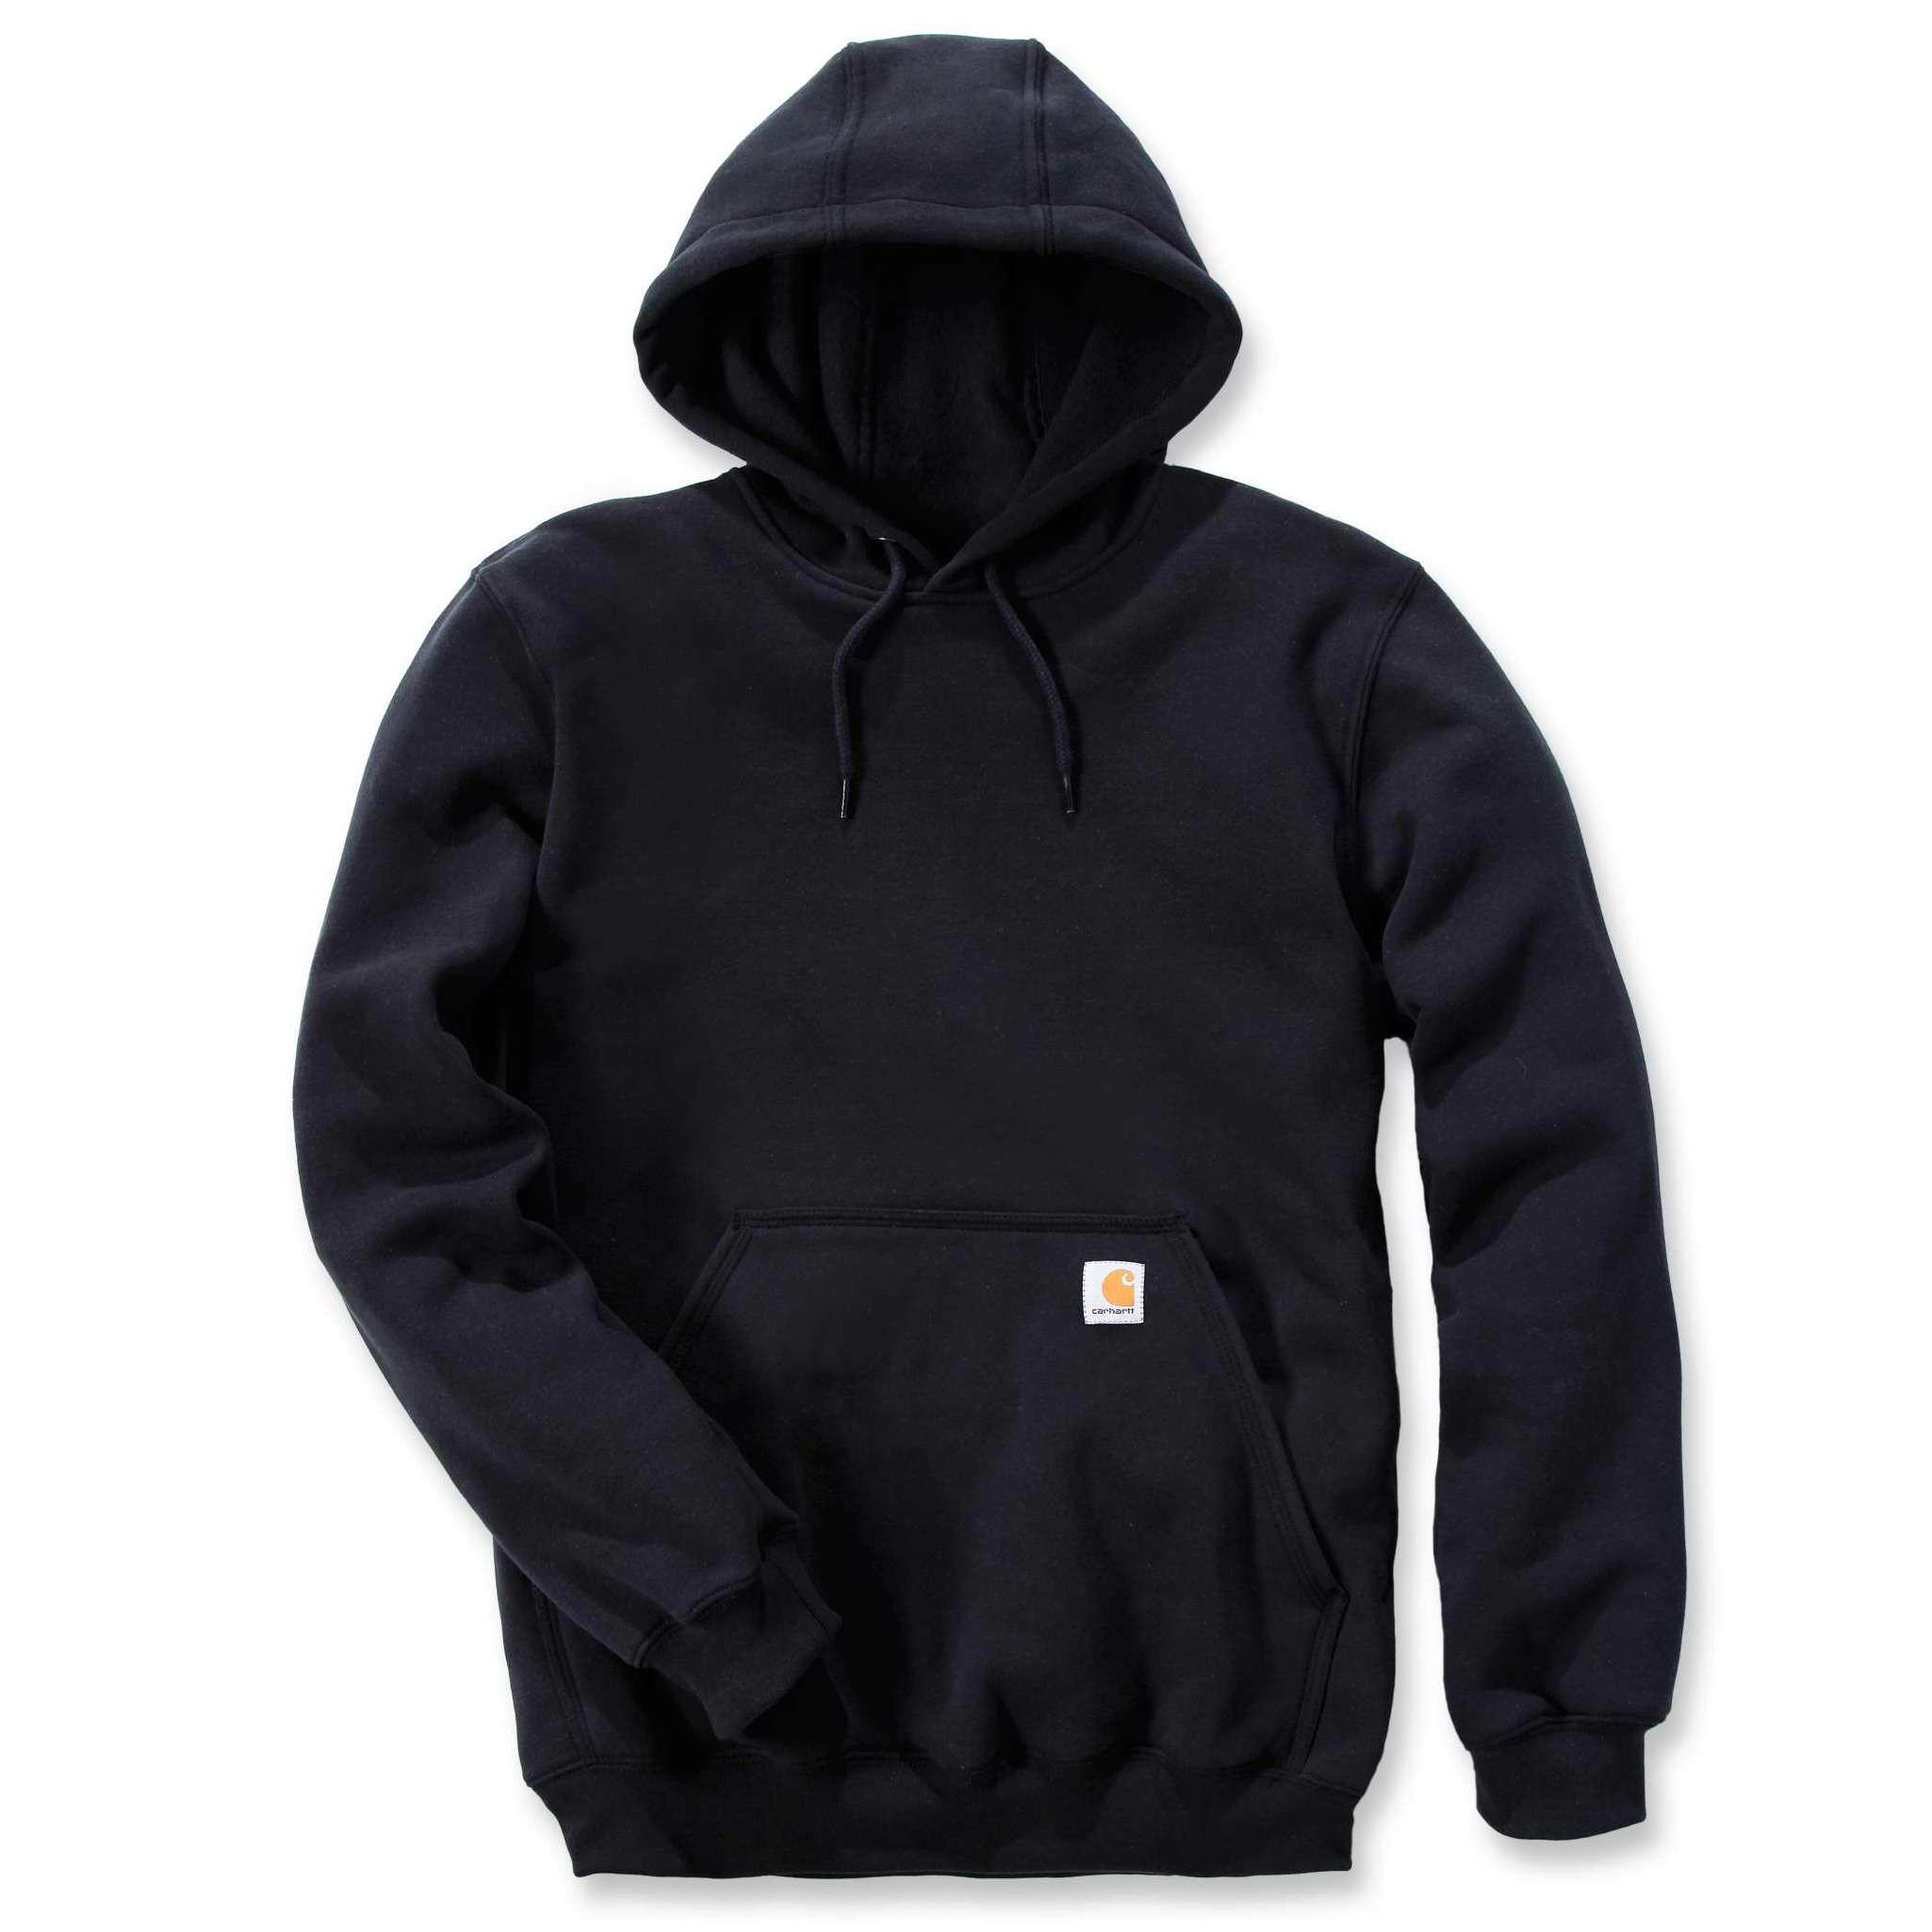 Худи Carhartt Hooded Sweatshirt - K121 (Black, M)